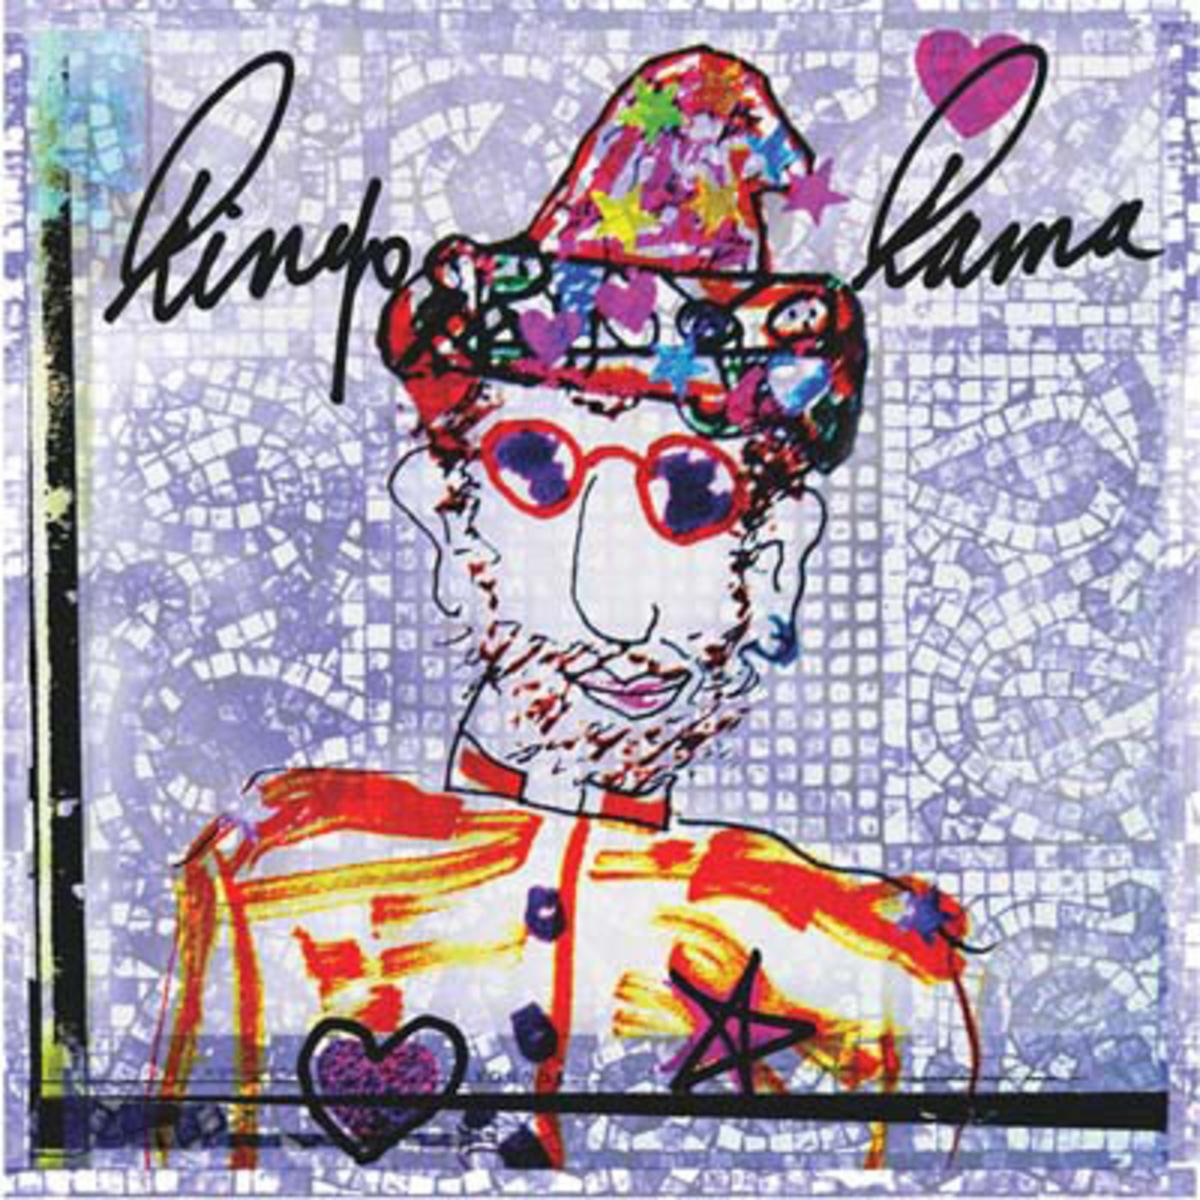 Ringo Rama - Limited Art Print by Ringo Starr